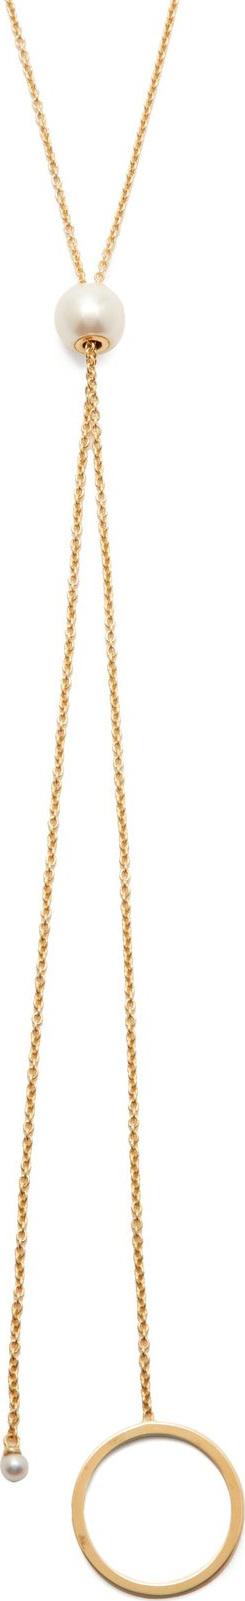 Delfina Delettrez Bubble pearl & 18kt gold necklace